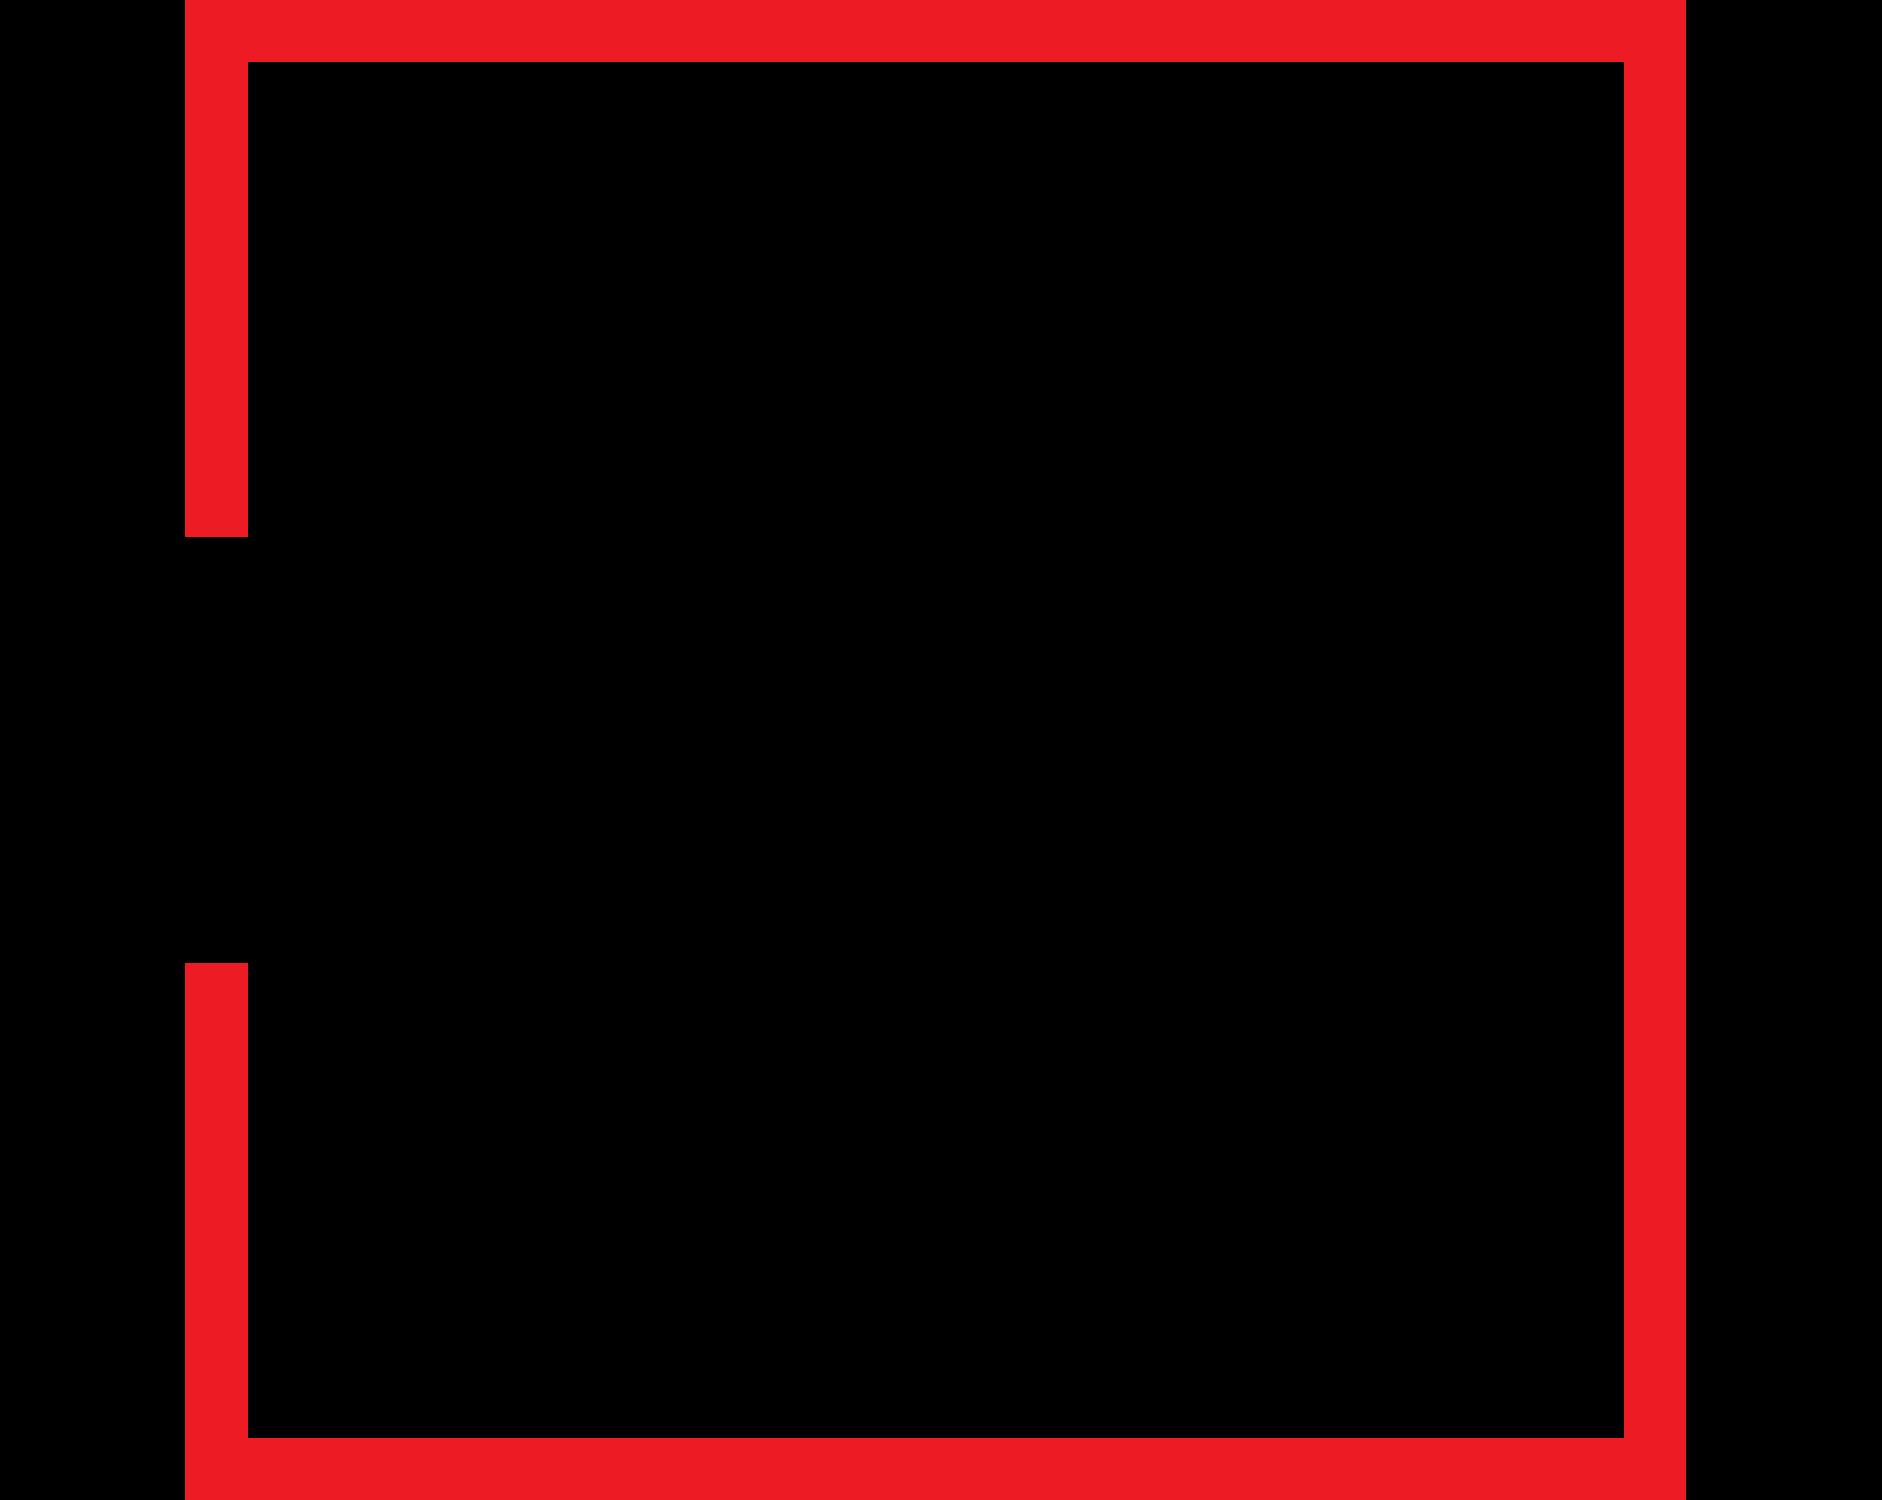 West_Corporation_logo.png